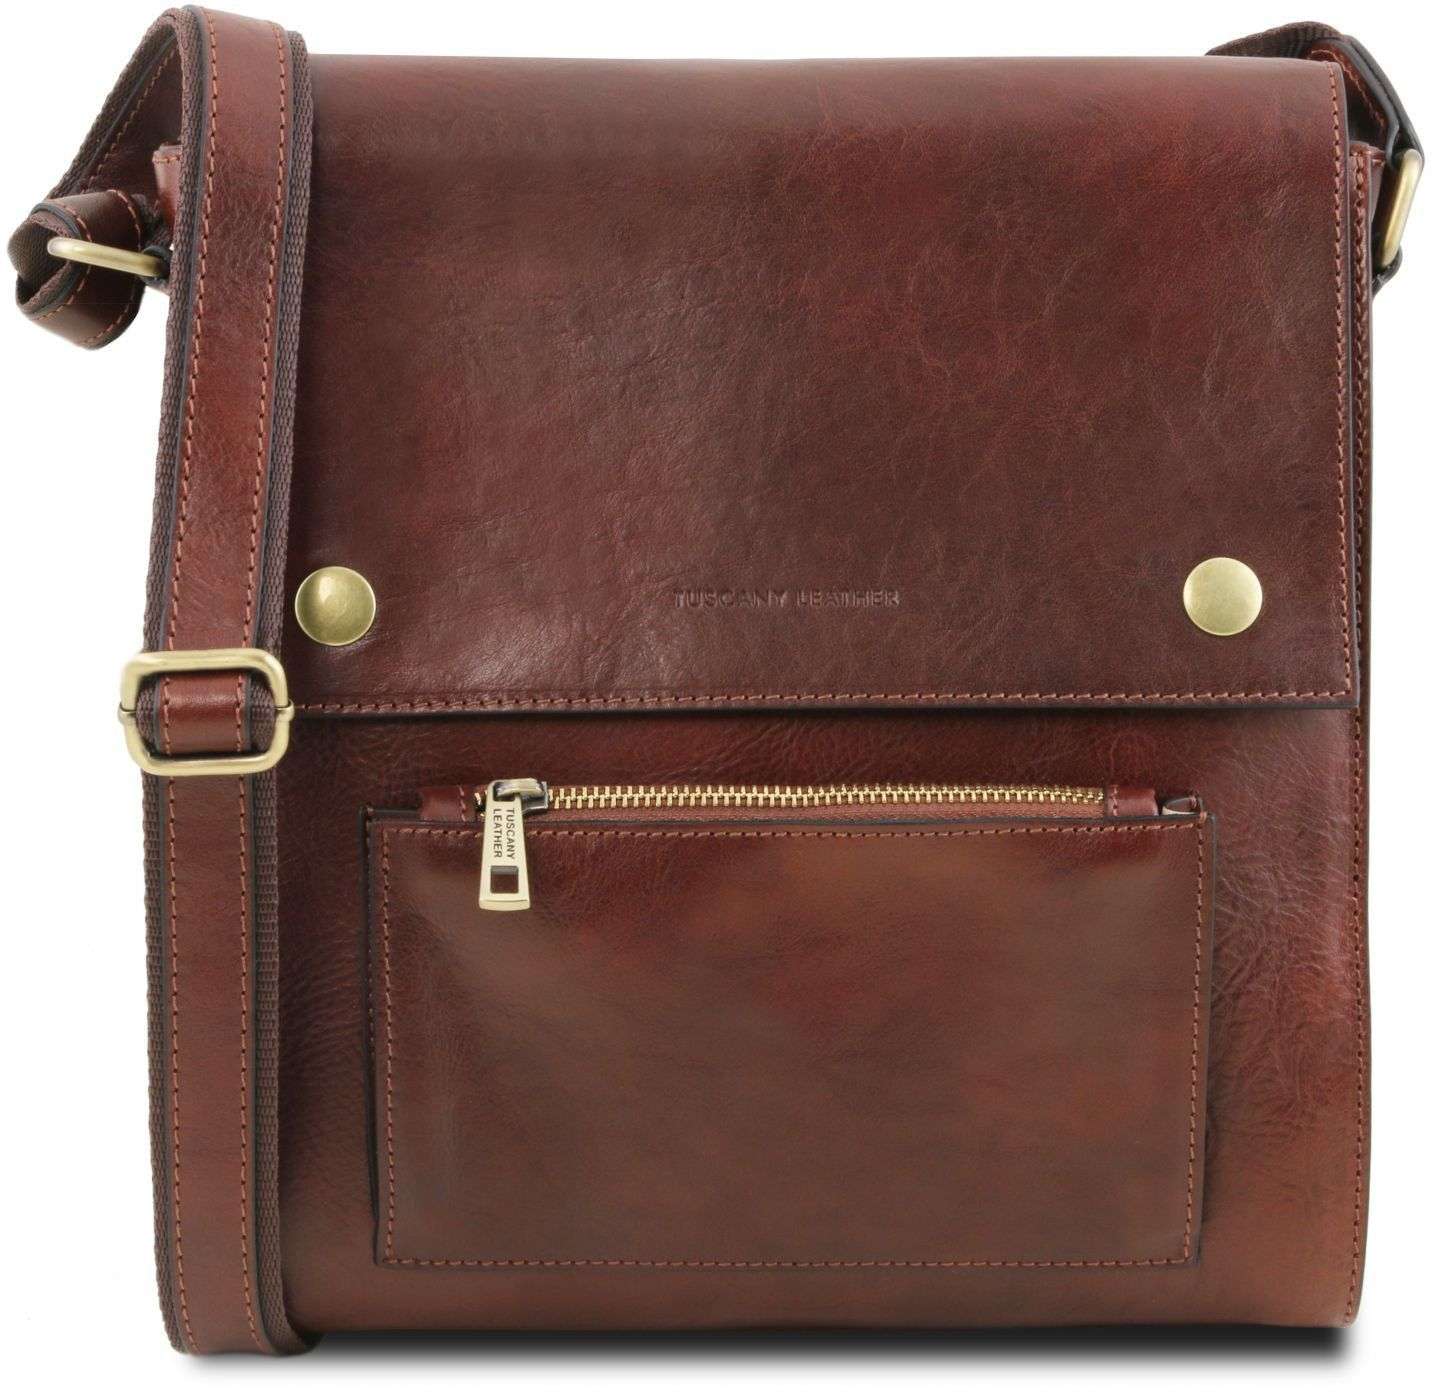 c30cc77103 Ανδρικό Τσαντάκι Δερμάτινο Oliver Καφέ Tuscany Leather